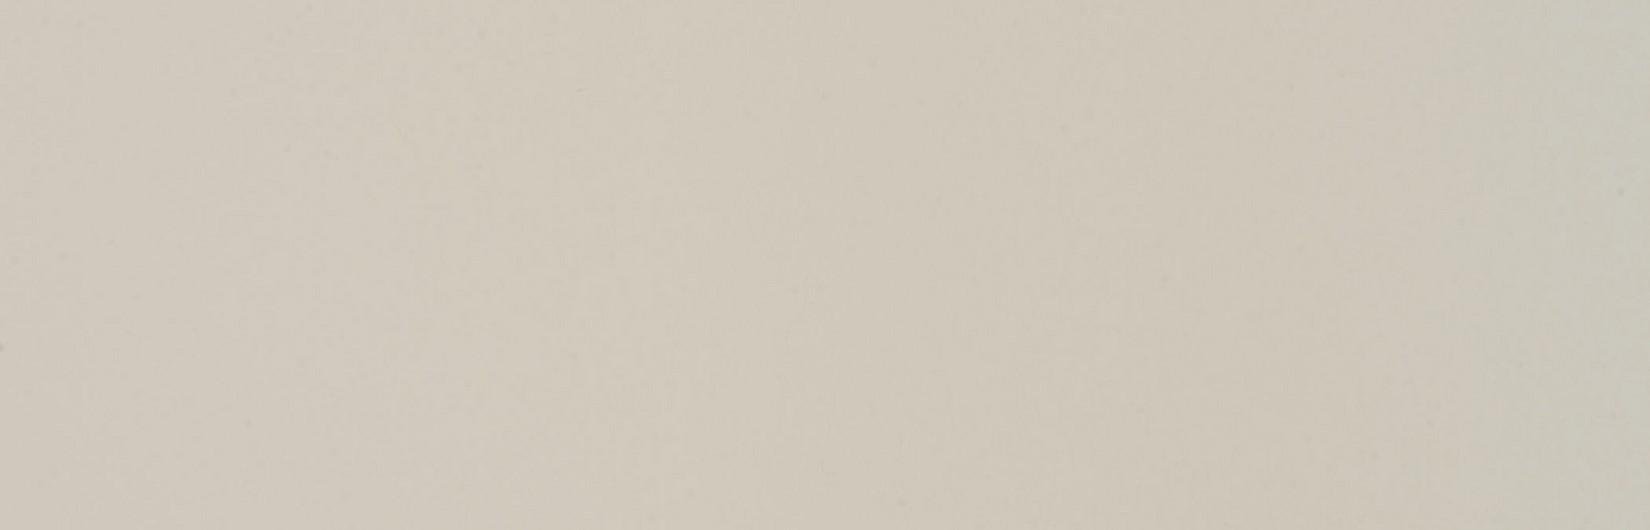 5035-createx-illustration-bloodline-old-bone-white.jpg